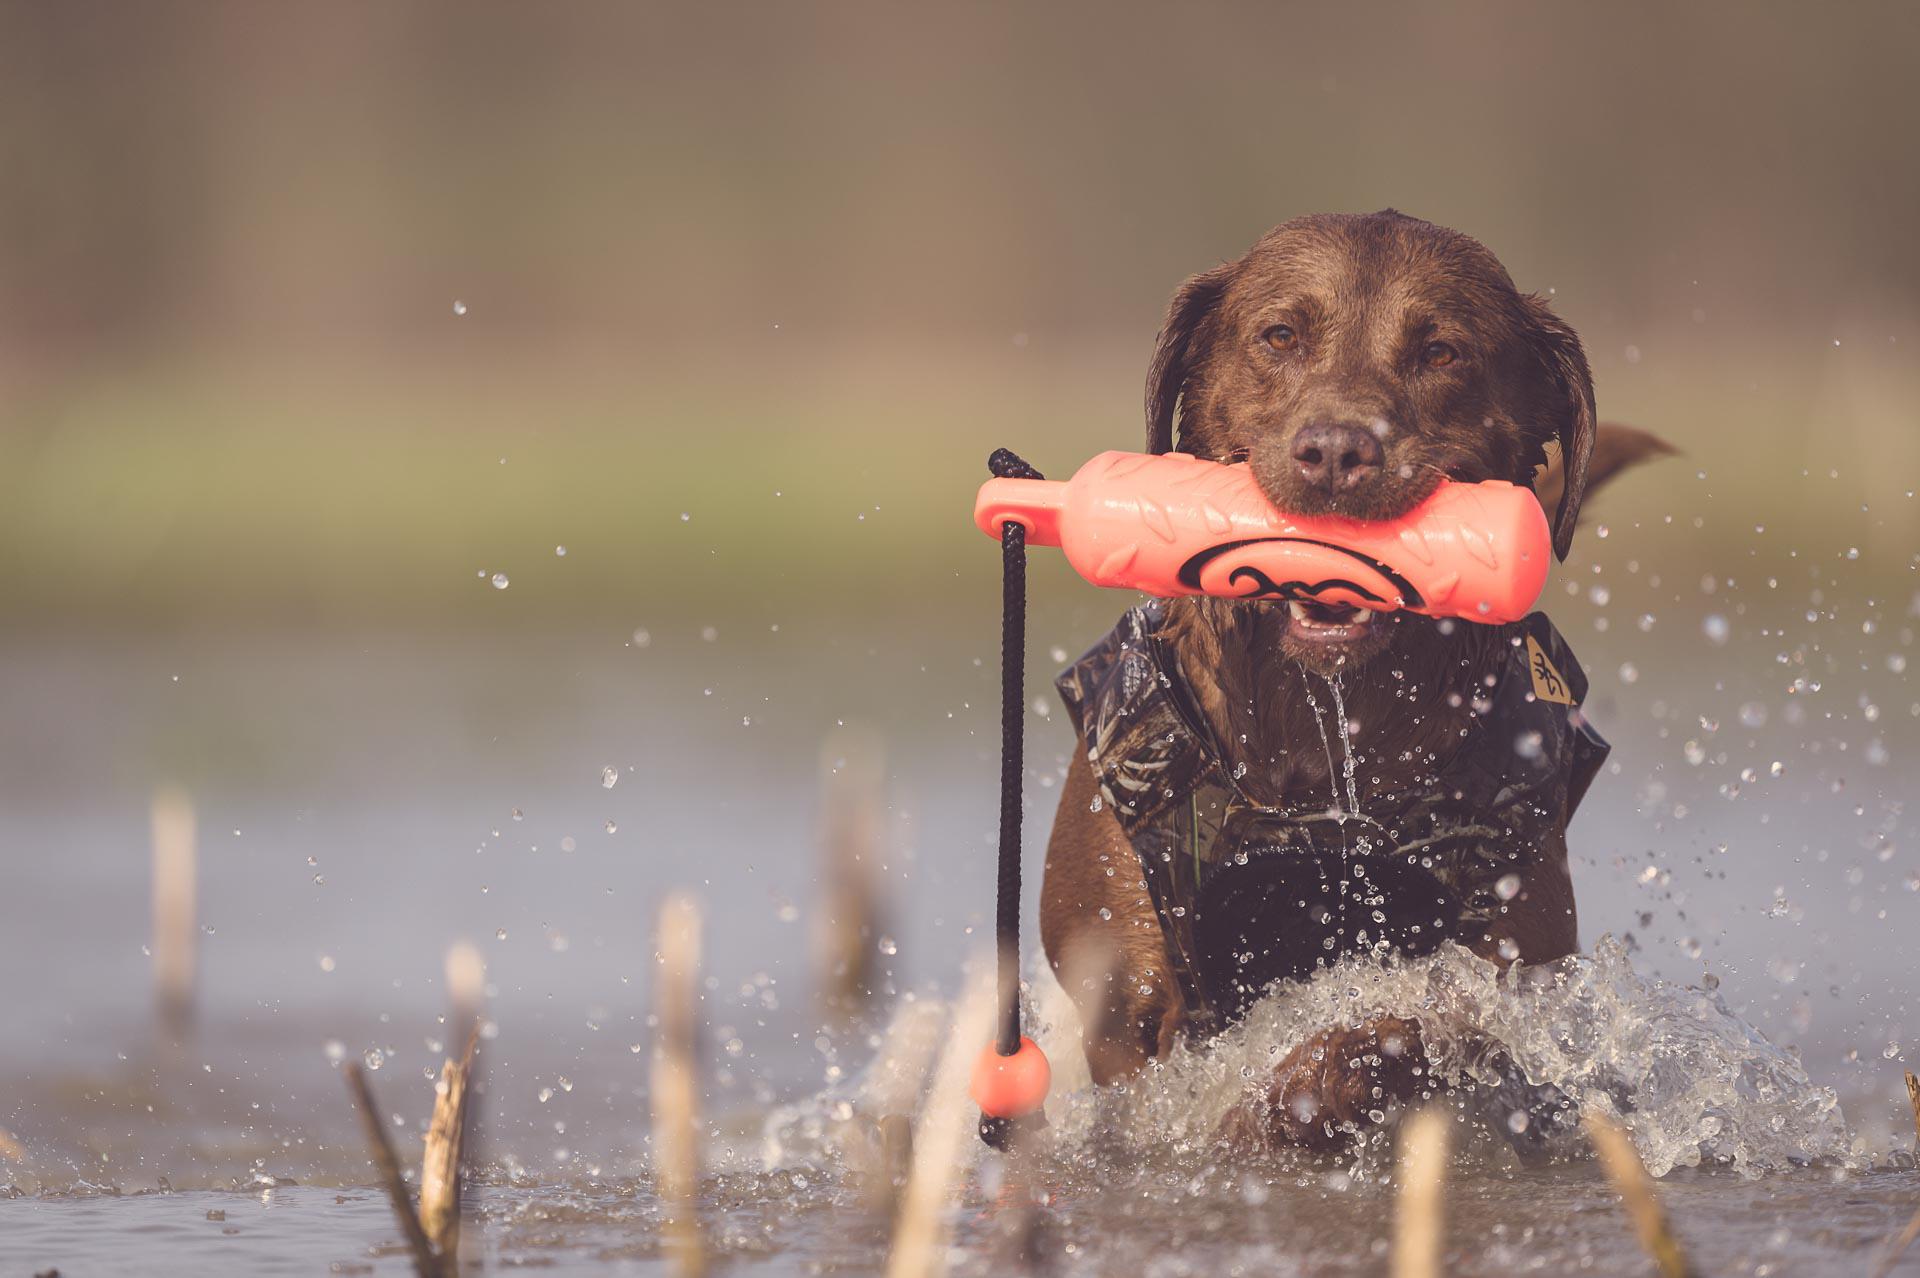 Chocolate lab retrieving a training bumper in water. © Tony Bynum